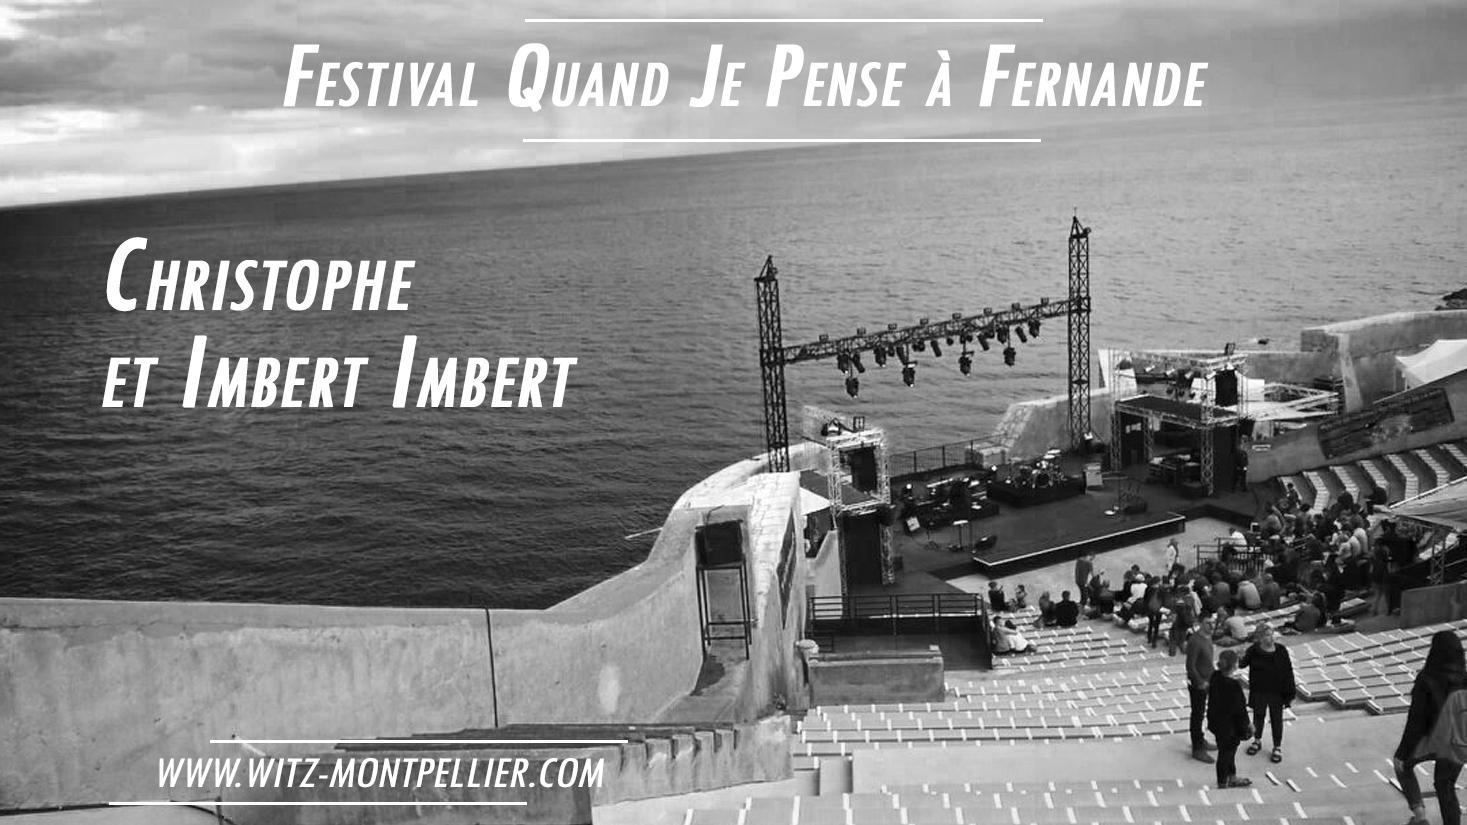 Christophe et Imbert Imbert au Festival Quand Je Pense à Fernande